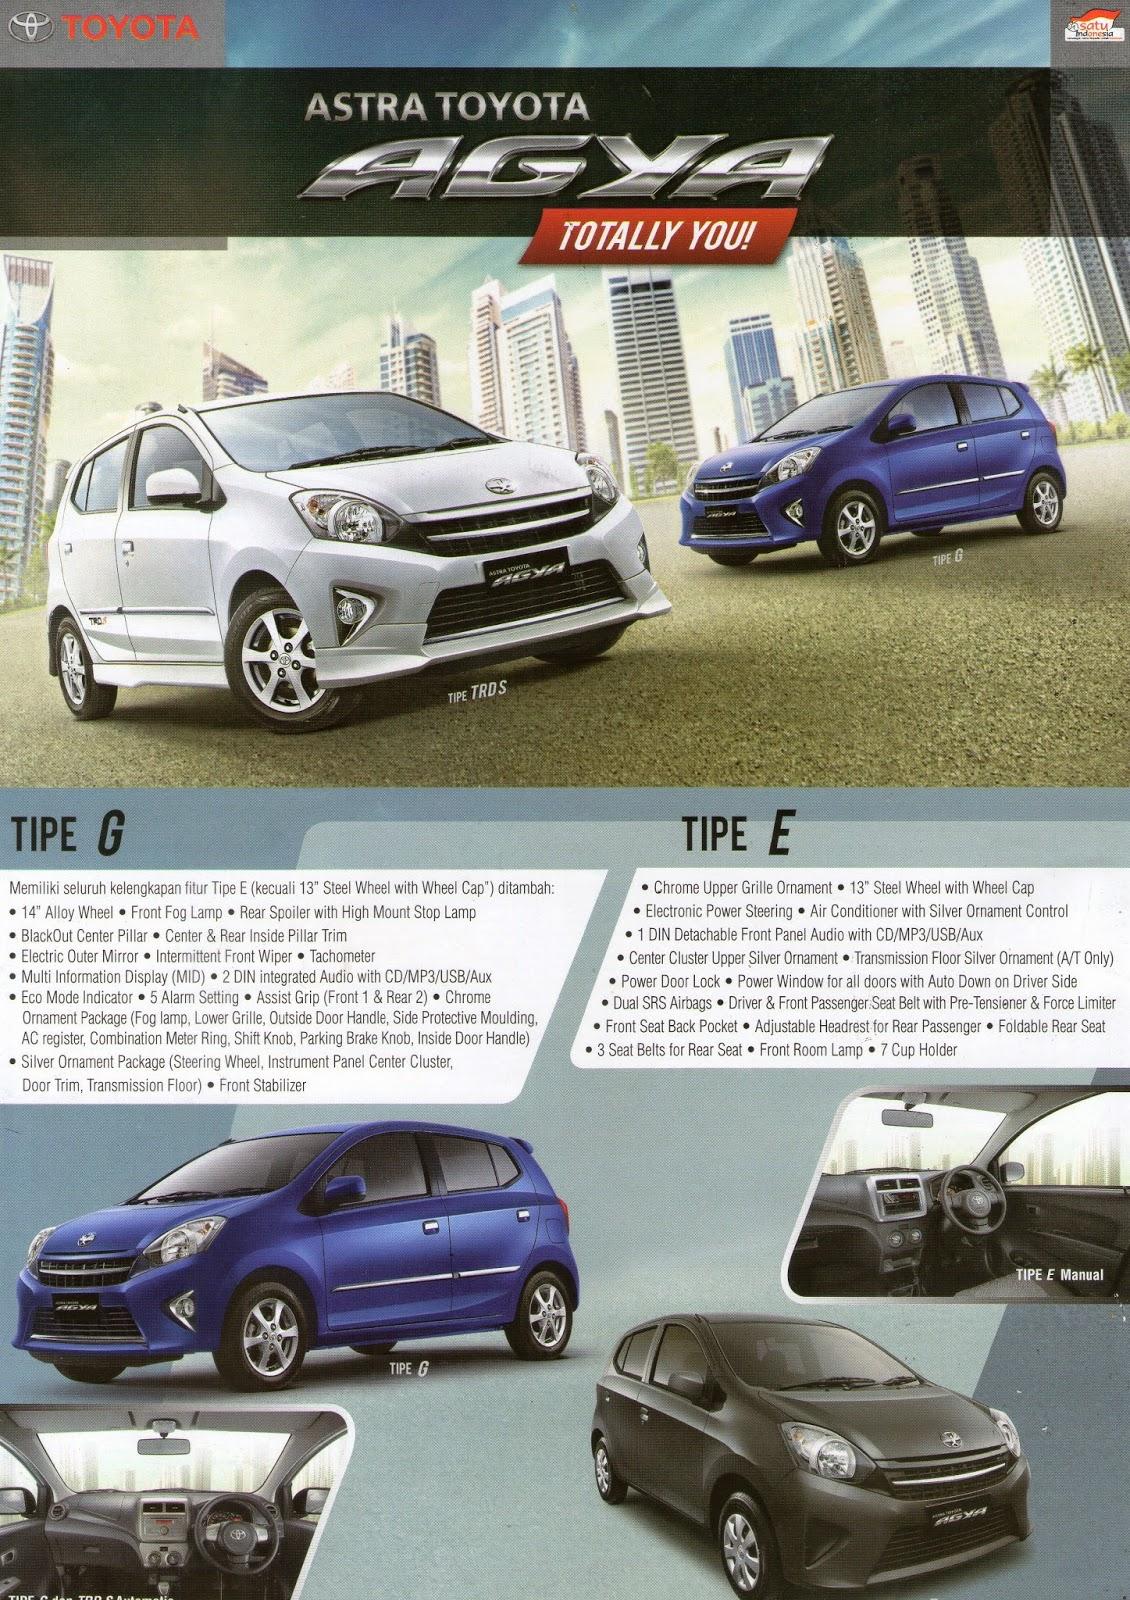 New Agya Trd Silver Brand Camry 2016 Price Pt Wira Megah Profitamas I Toyota